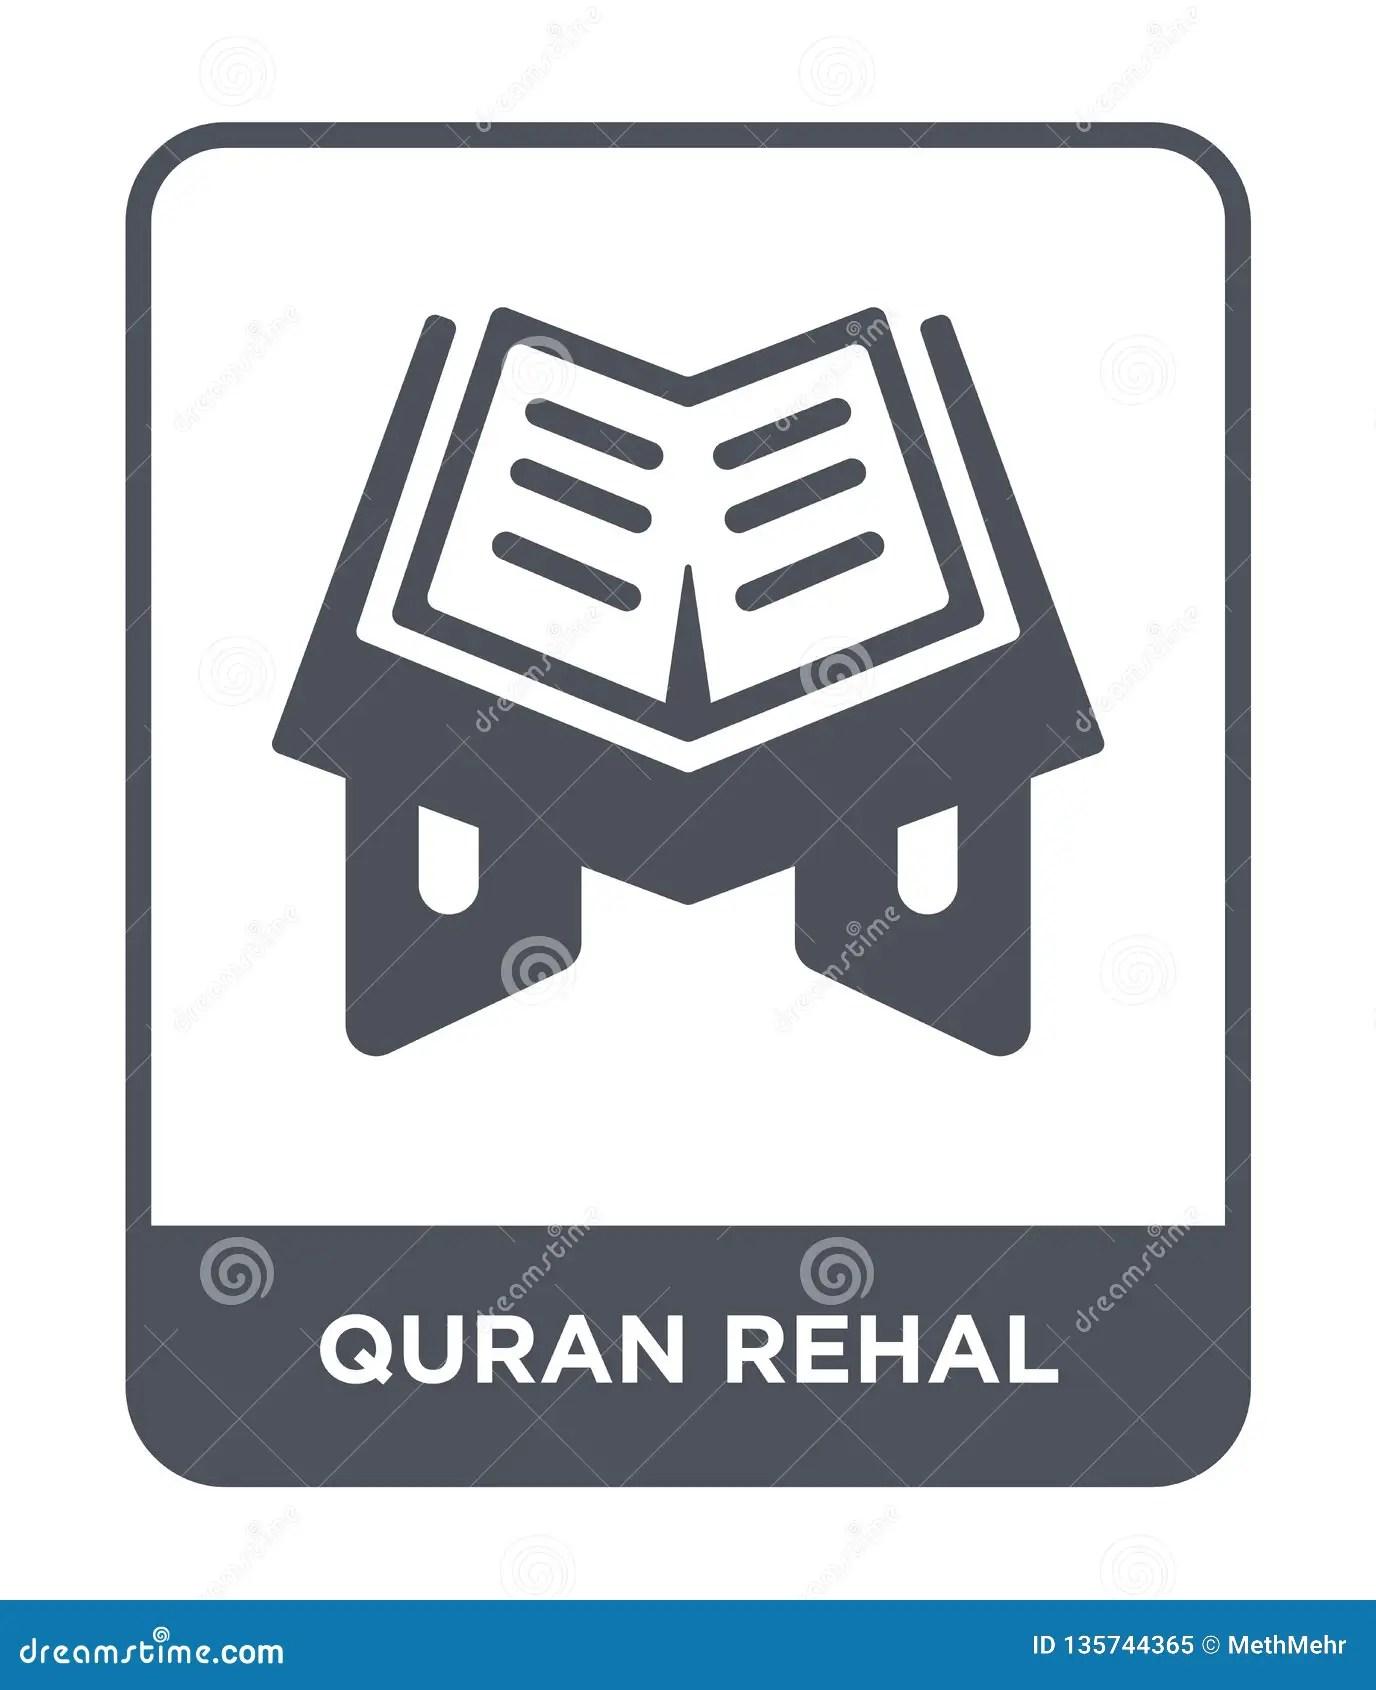 Logo Quran Vector : quran, vector, White, Background, Quran, Stock, Illustrations, 4,616, Illustrations,, Vectors, Clipart, Dreamstime